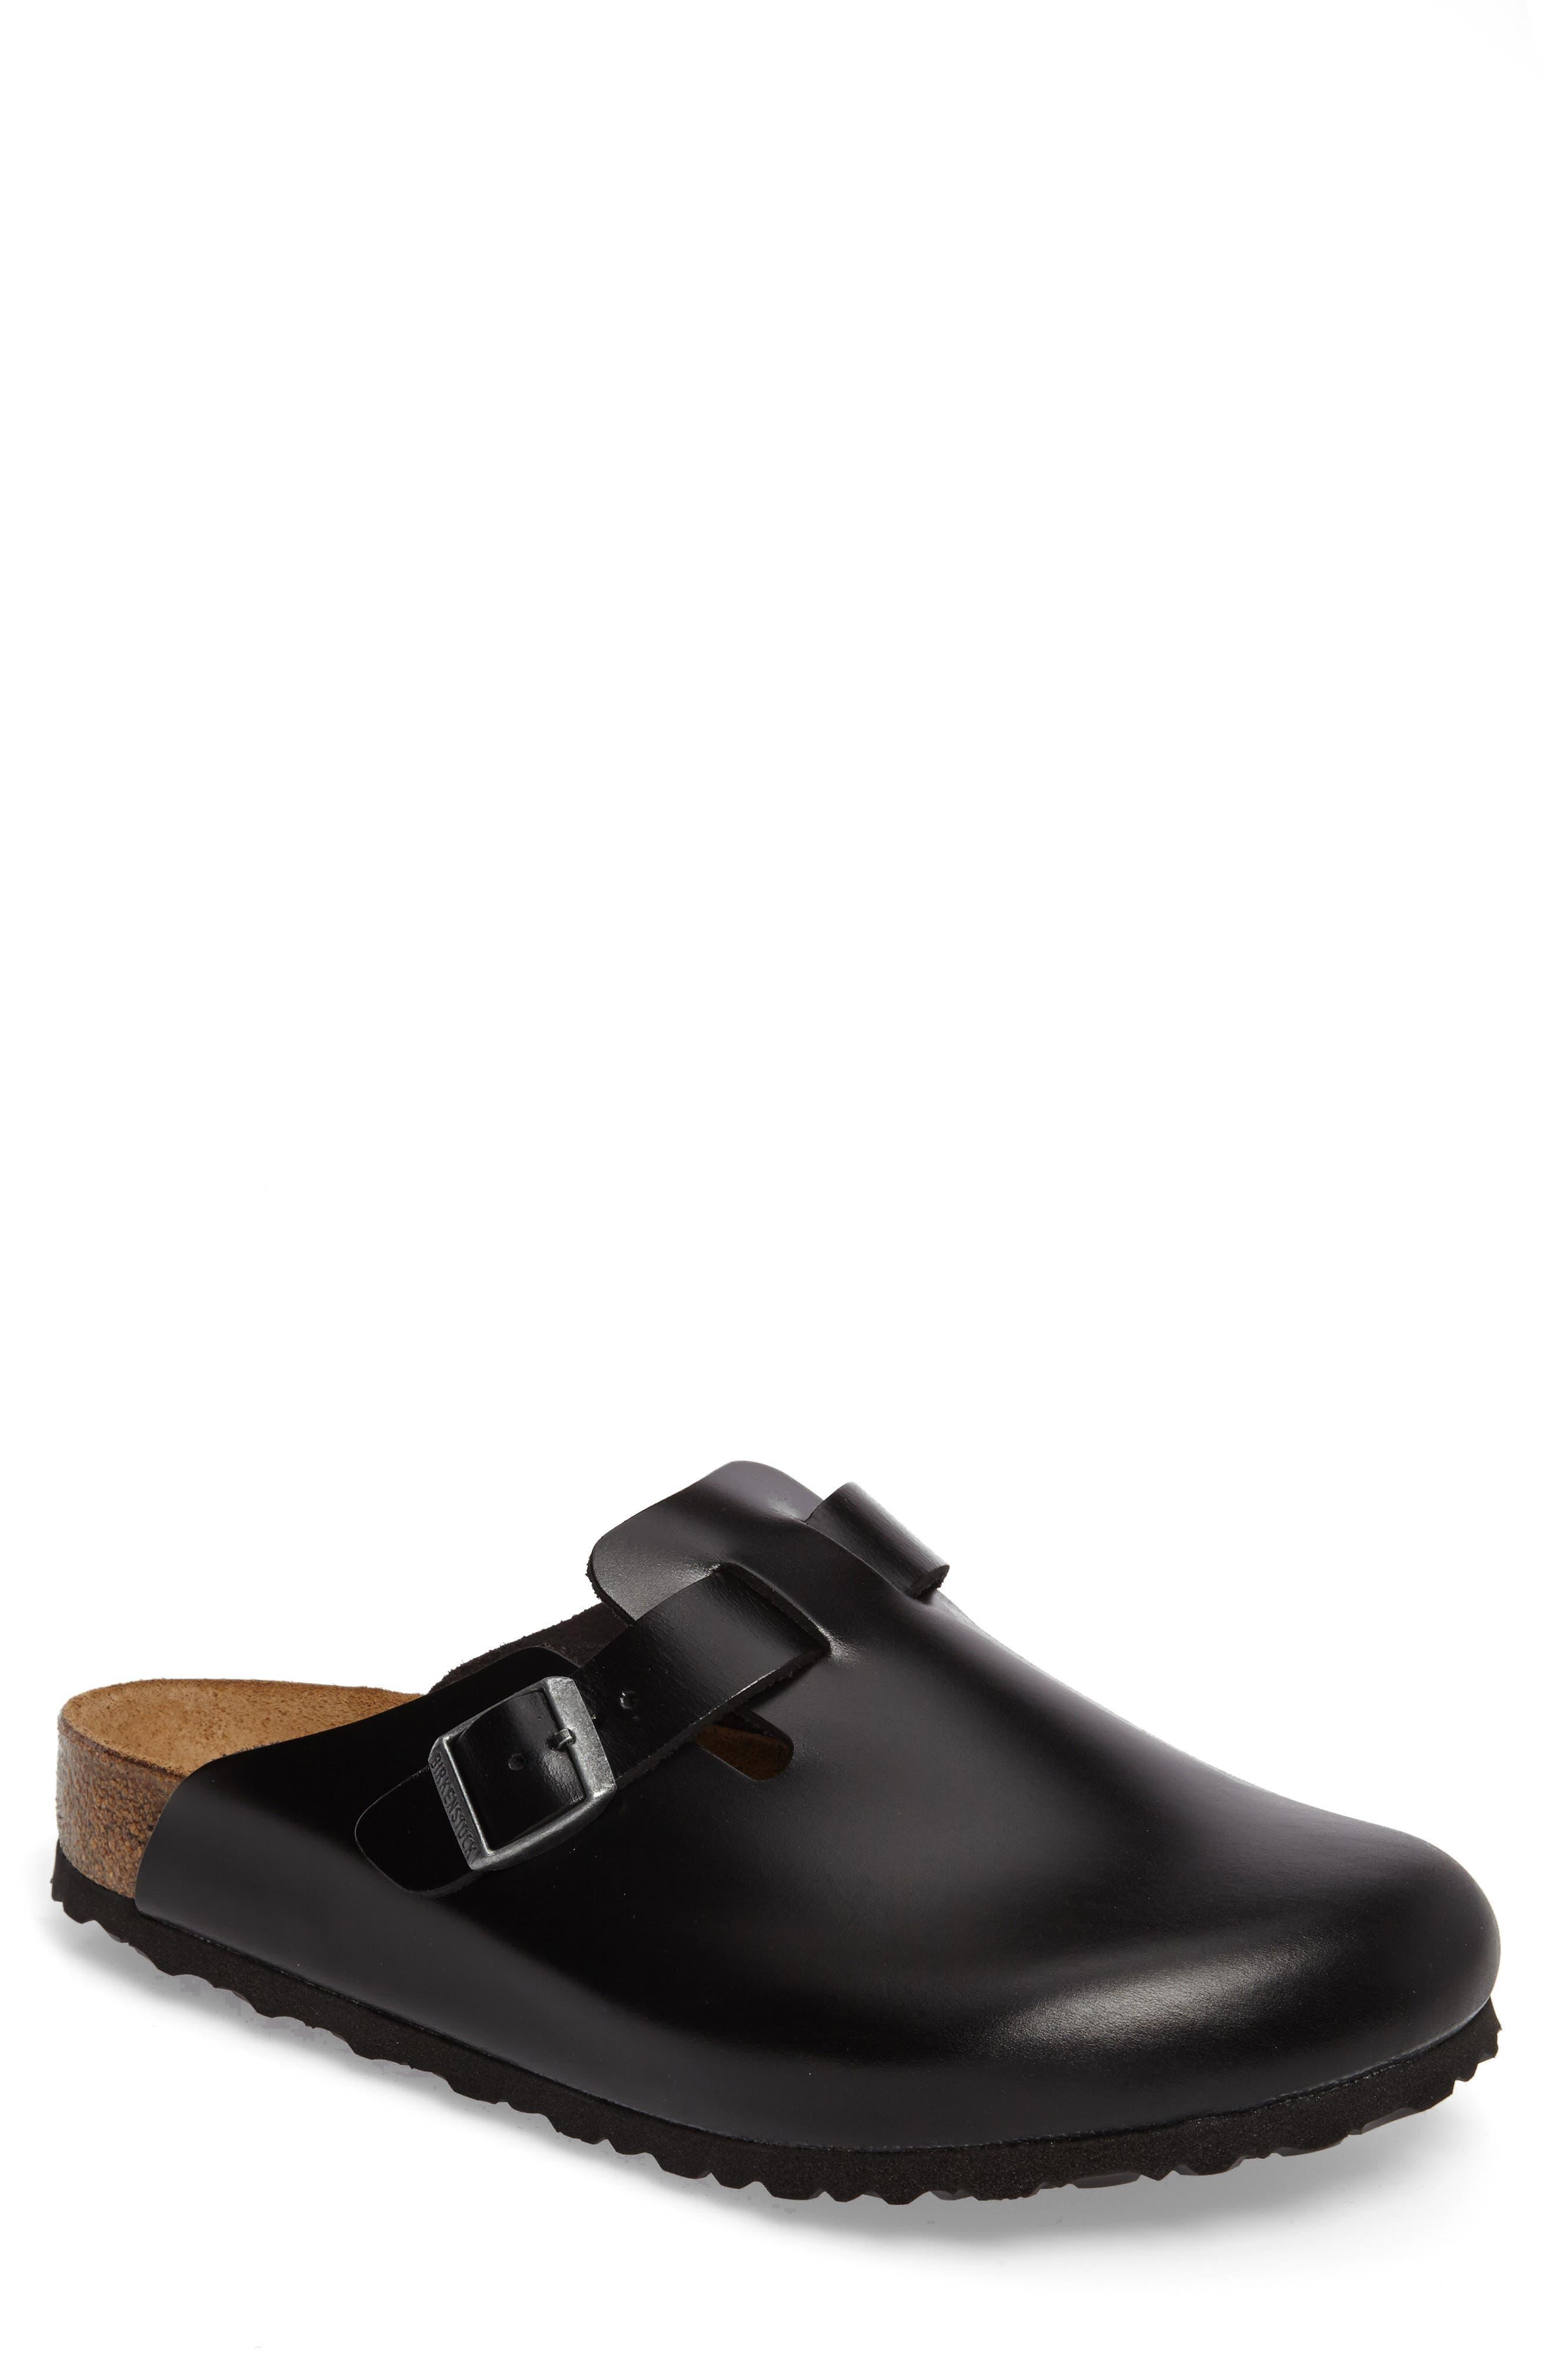 Birkenstock Boston Soft Clog,8.5 - Black